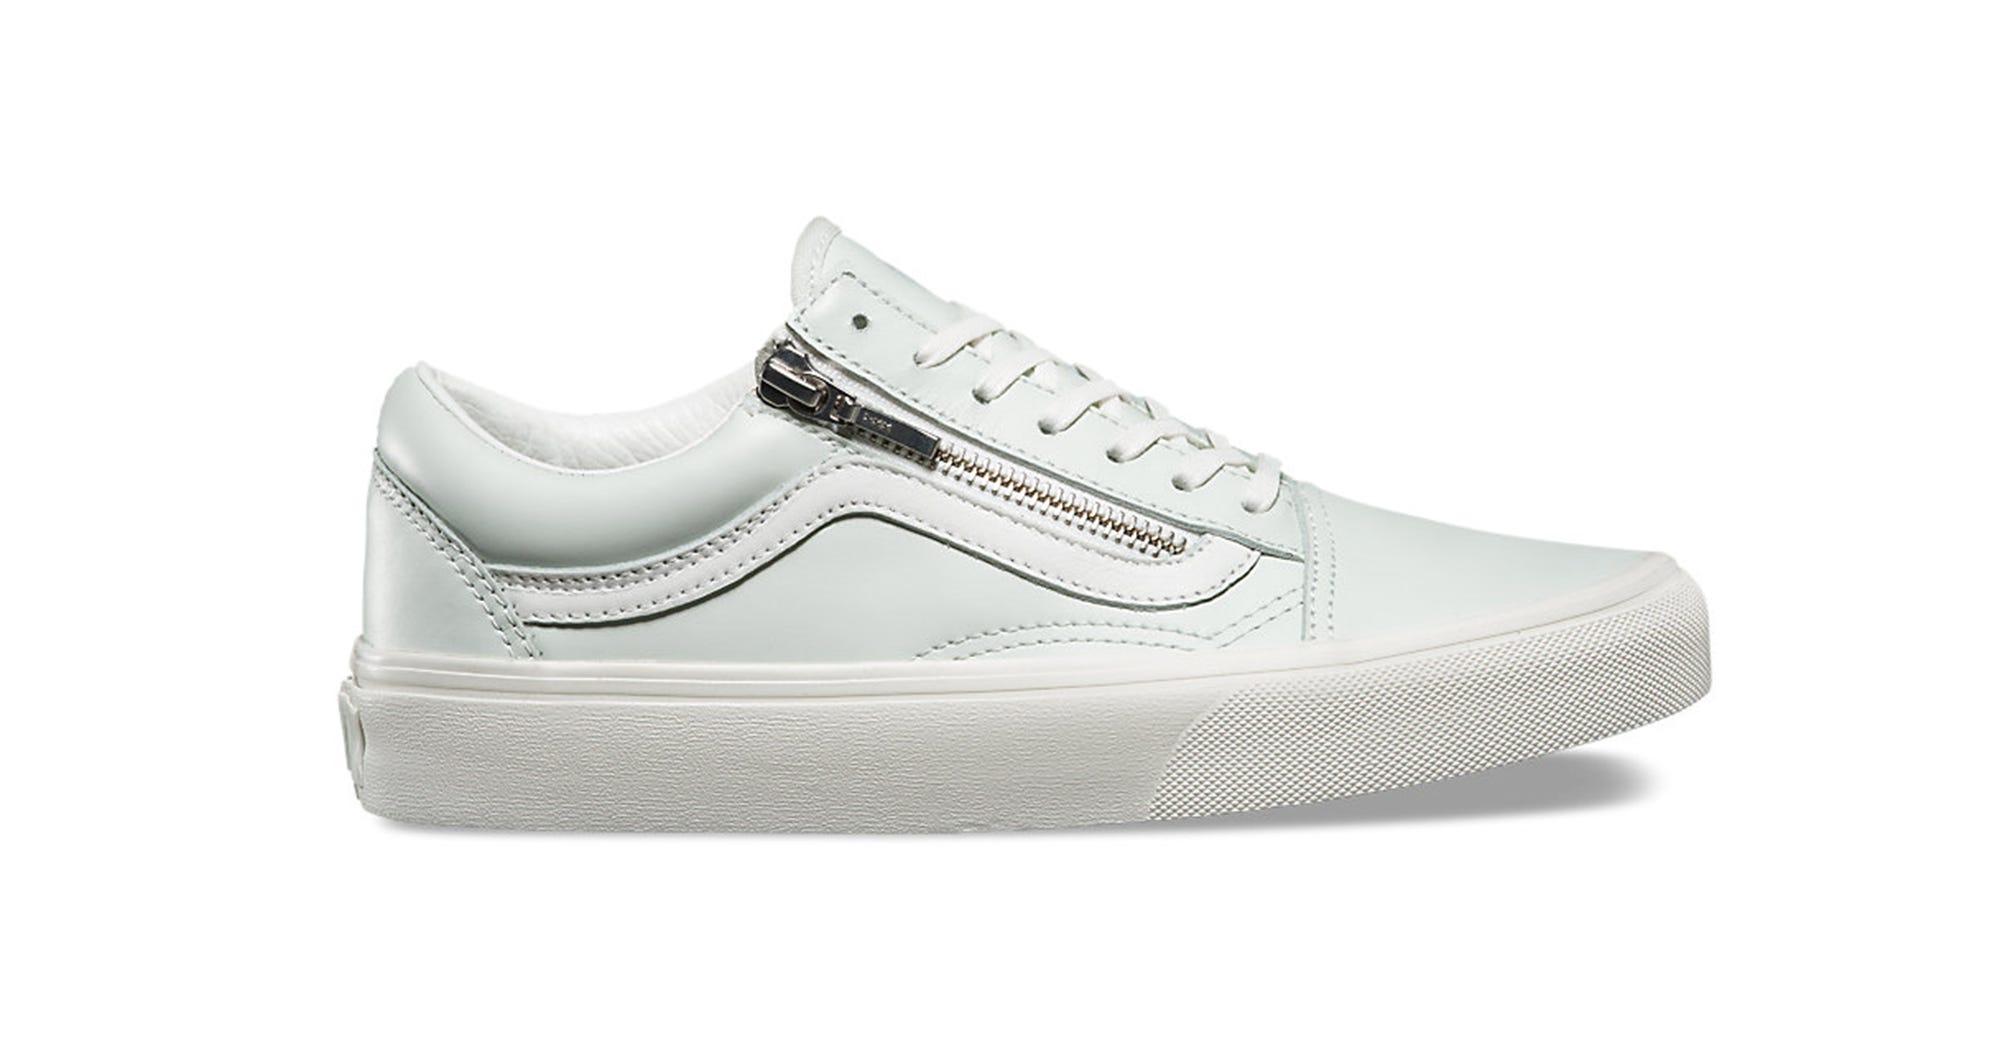 93f6ce47f05d3e Vans Shoes Best Styles Summer 2017 Collection